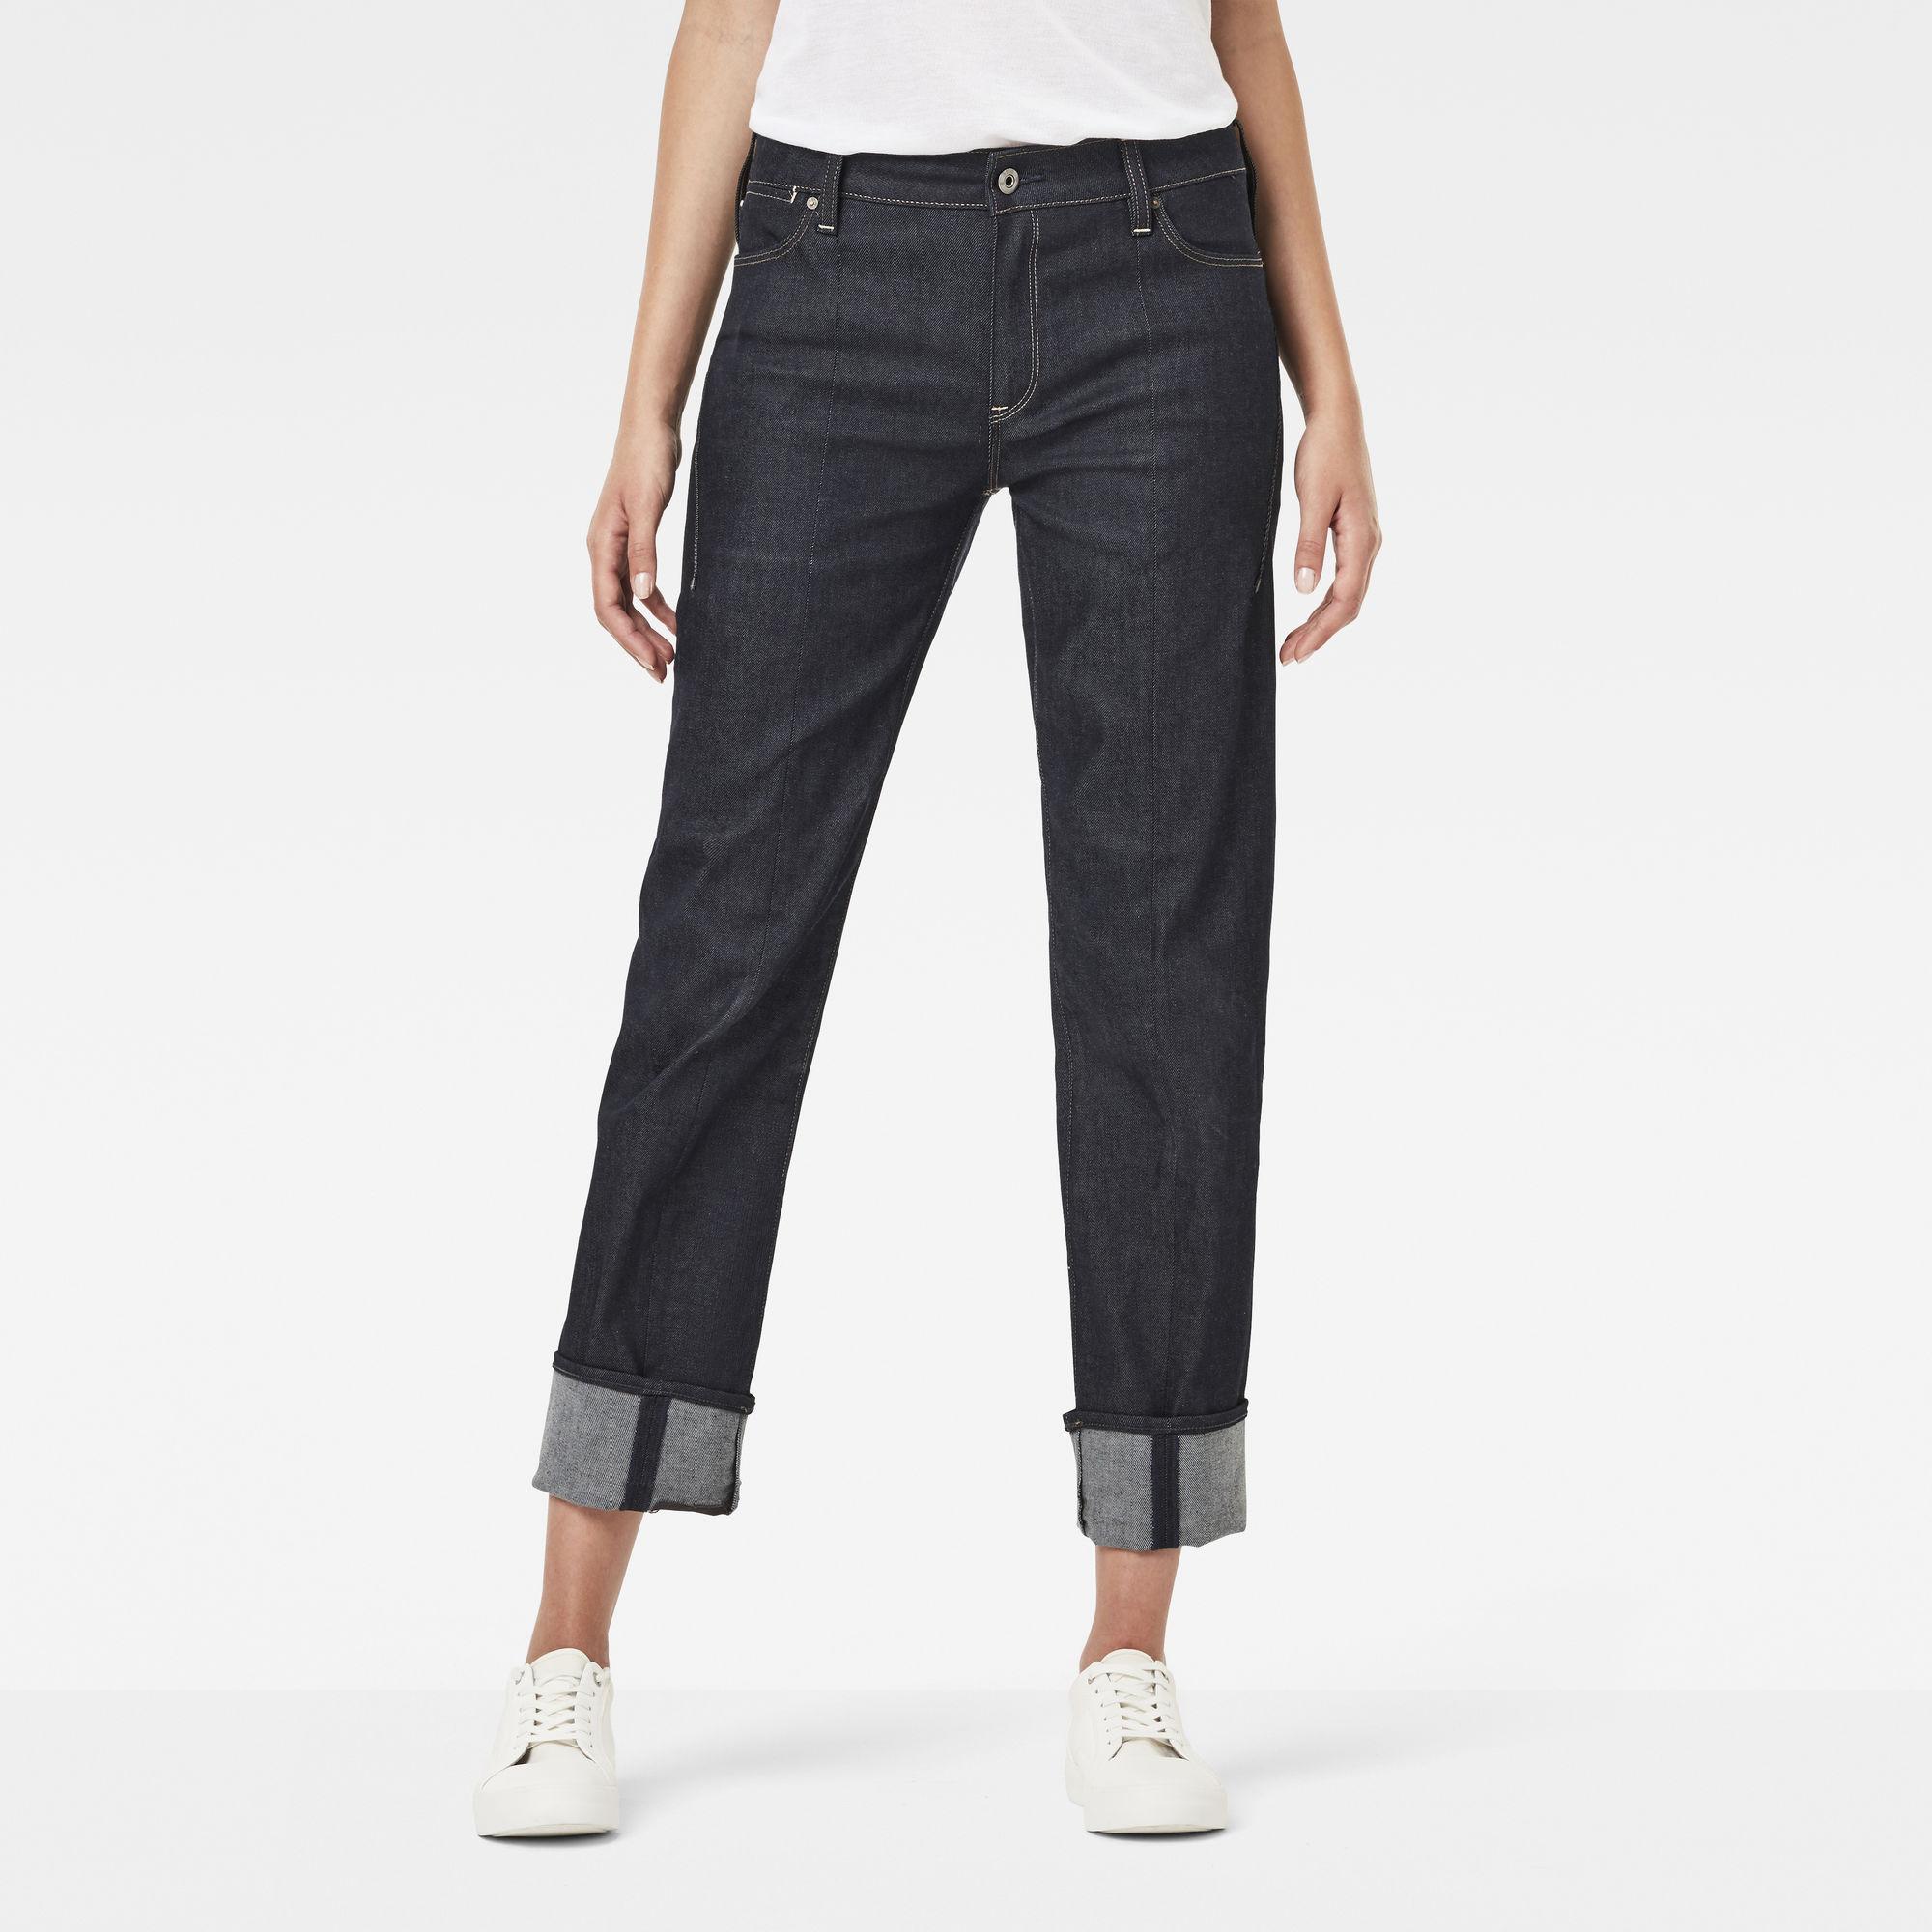 Lanc 3D High Waist Straight Prestored Jeans